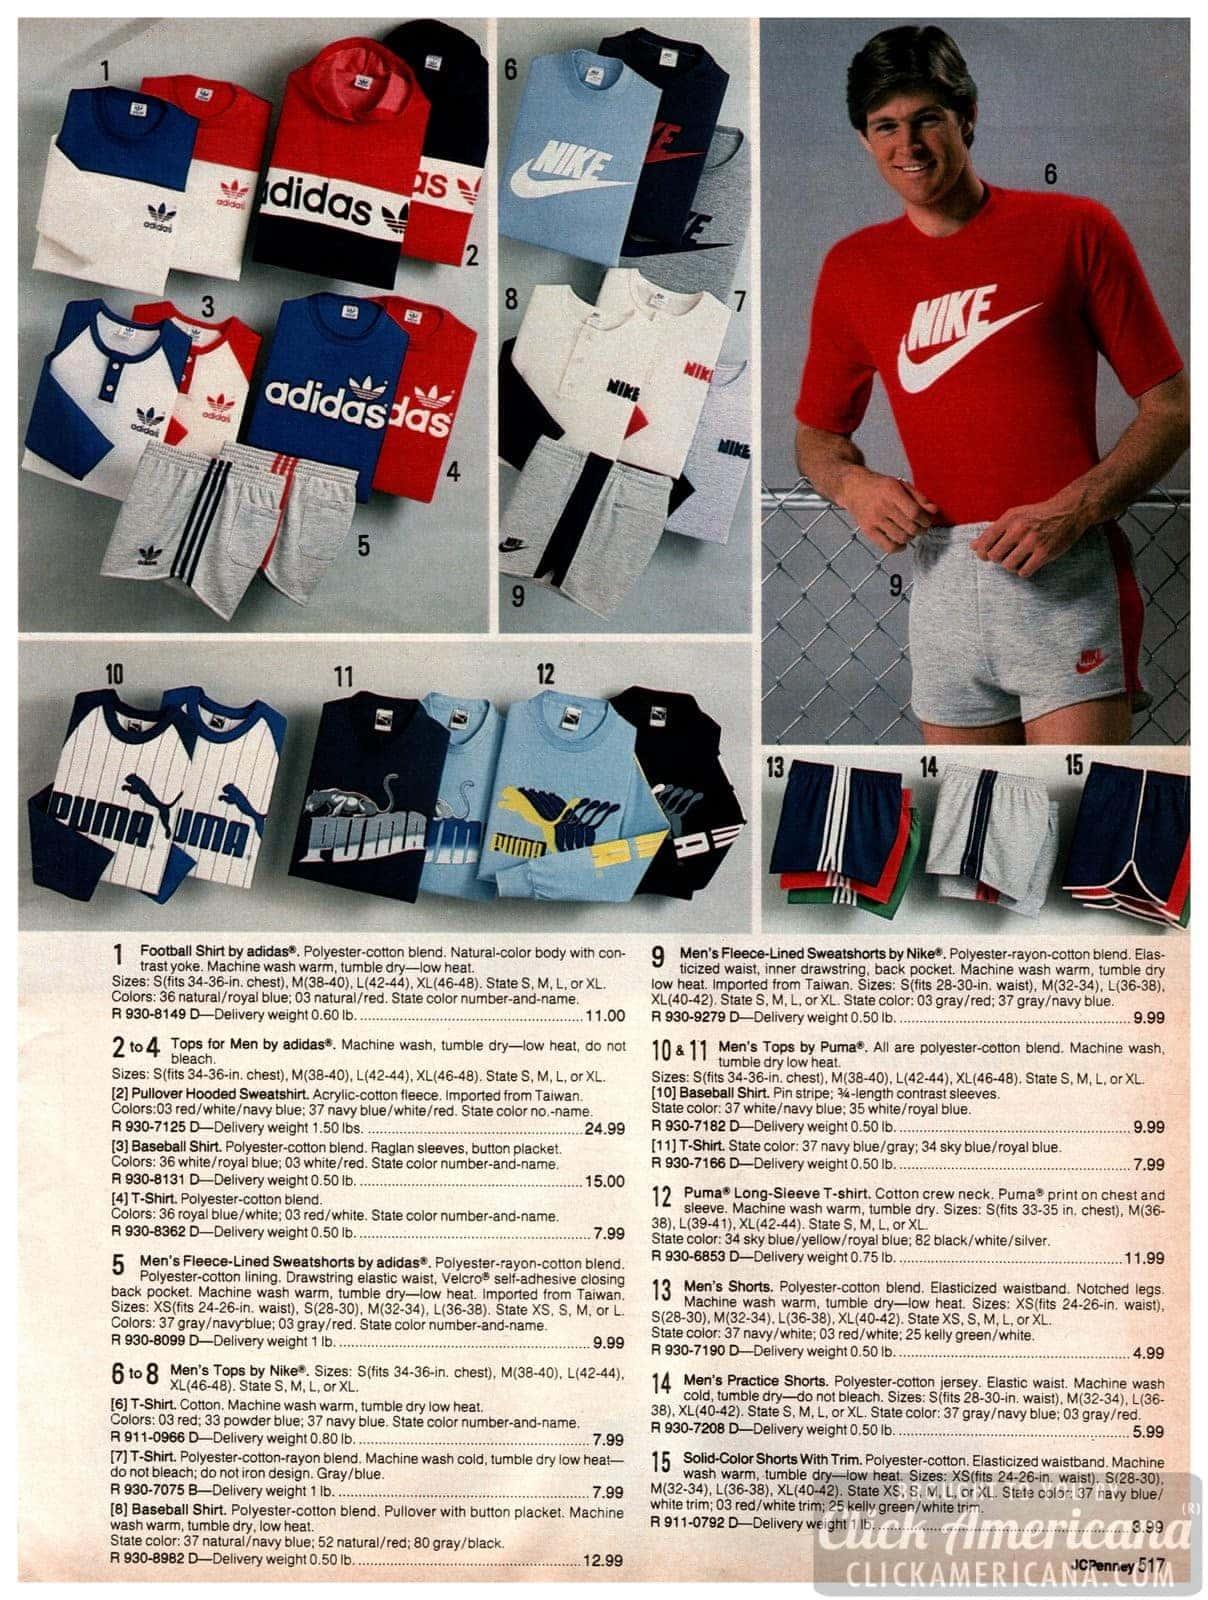 Vintage sportswear brands for men - Nike, Adidas, Puma